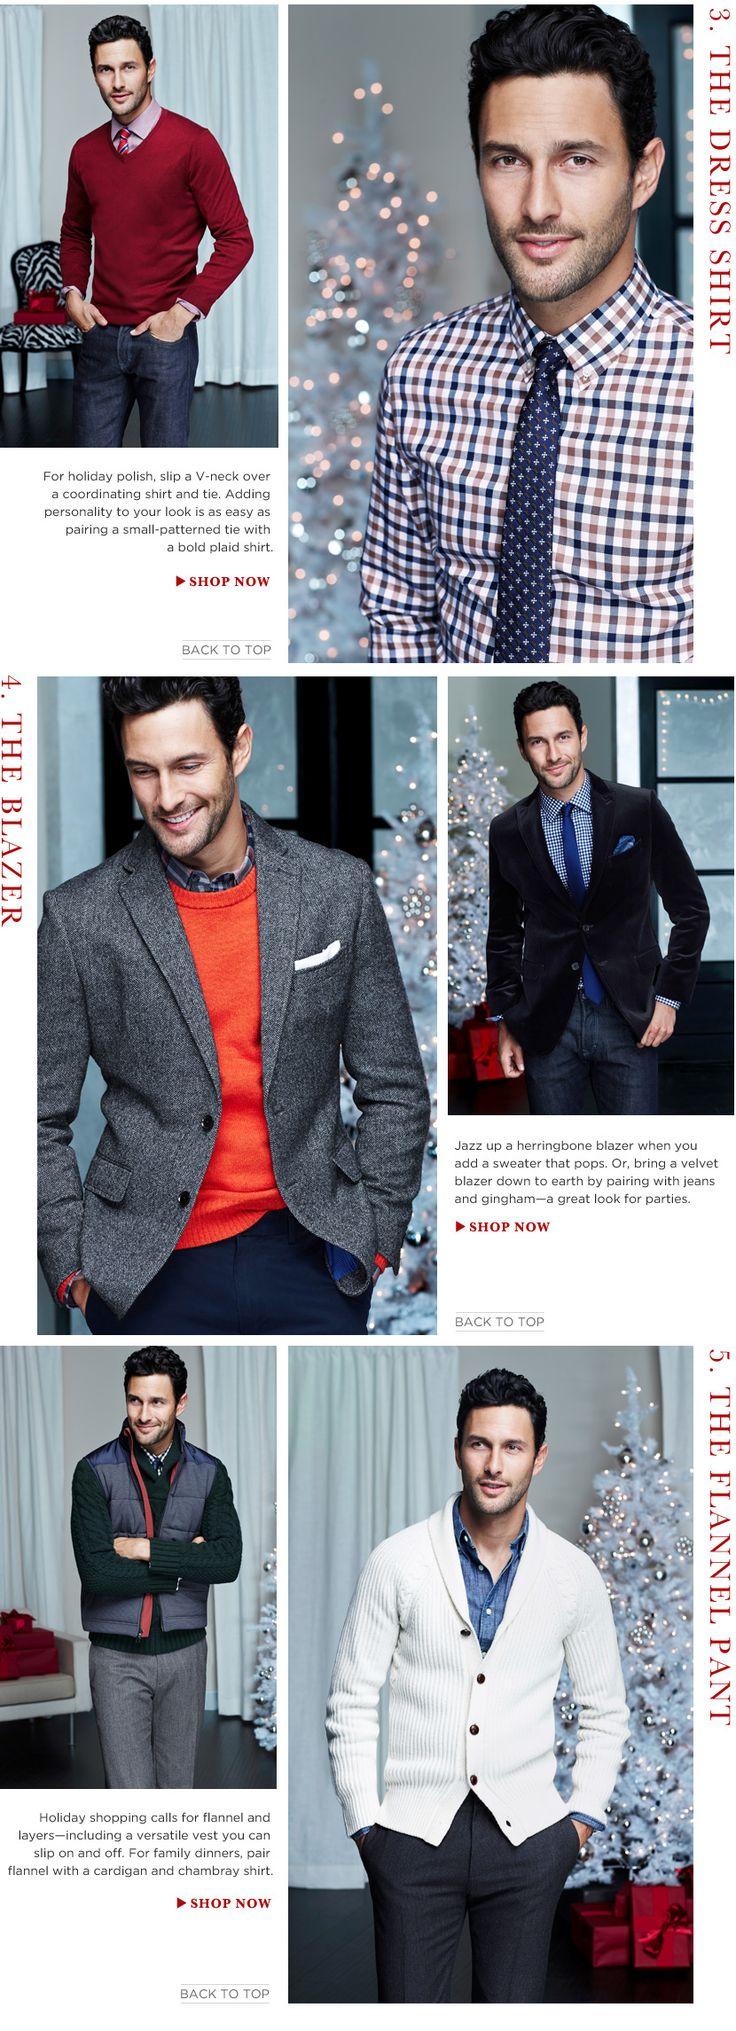 Men's Apparel: Find our shirts, pants, polos, jeans, suits, blazers, outerwear, shoes & accessories | Banana Republic